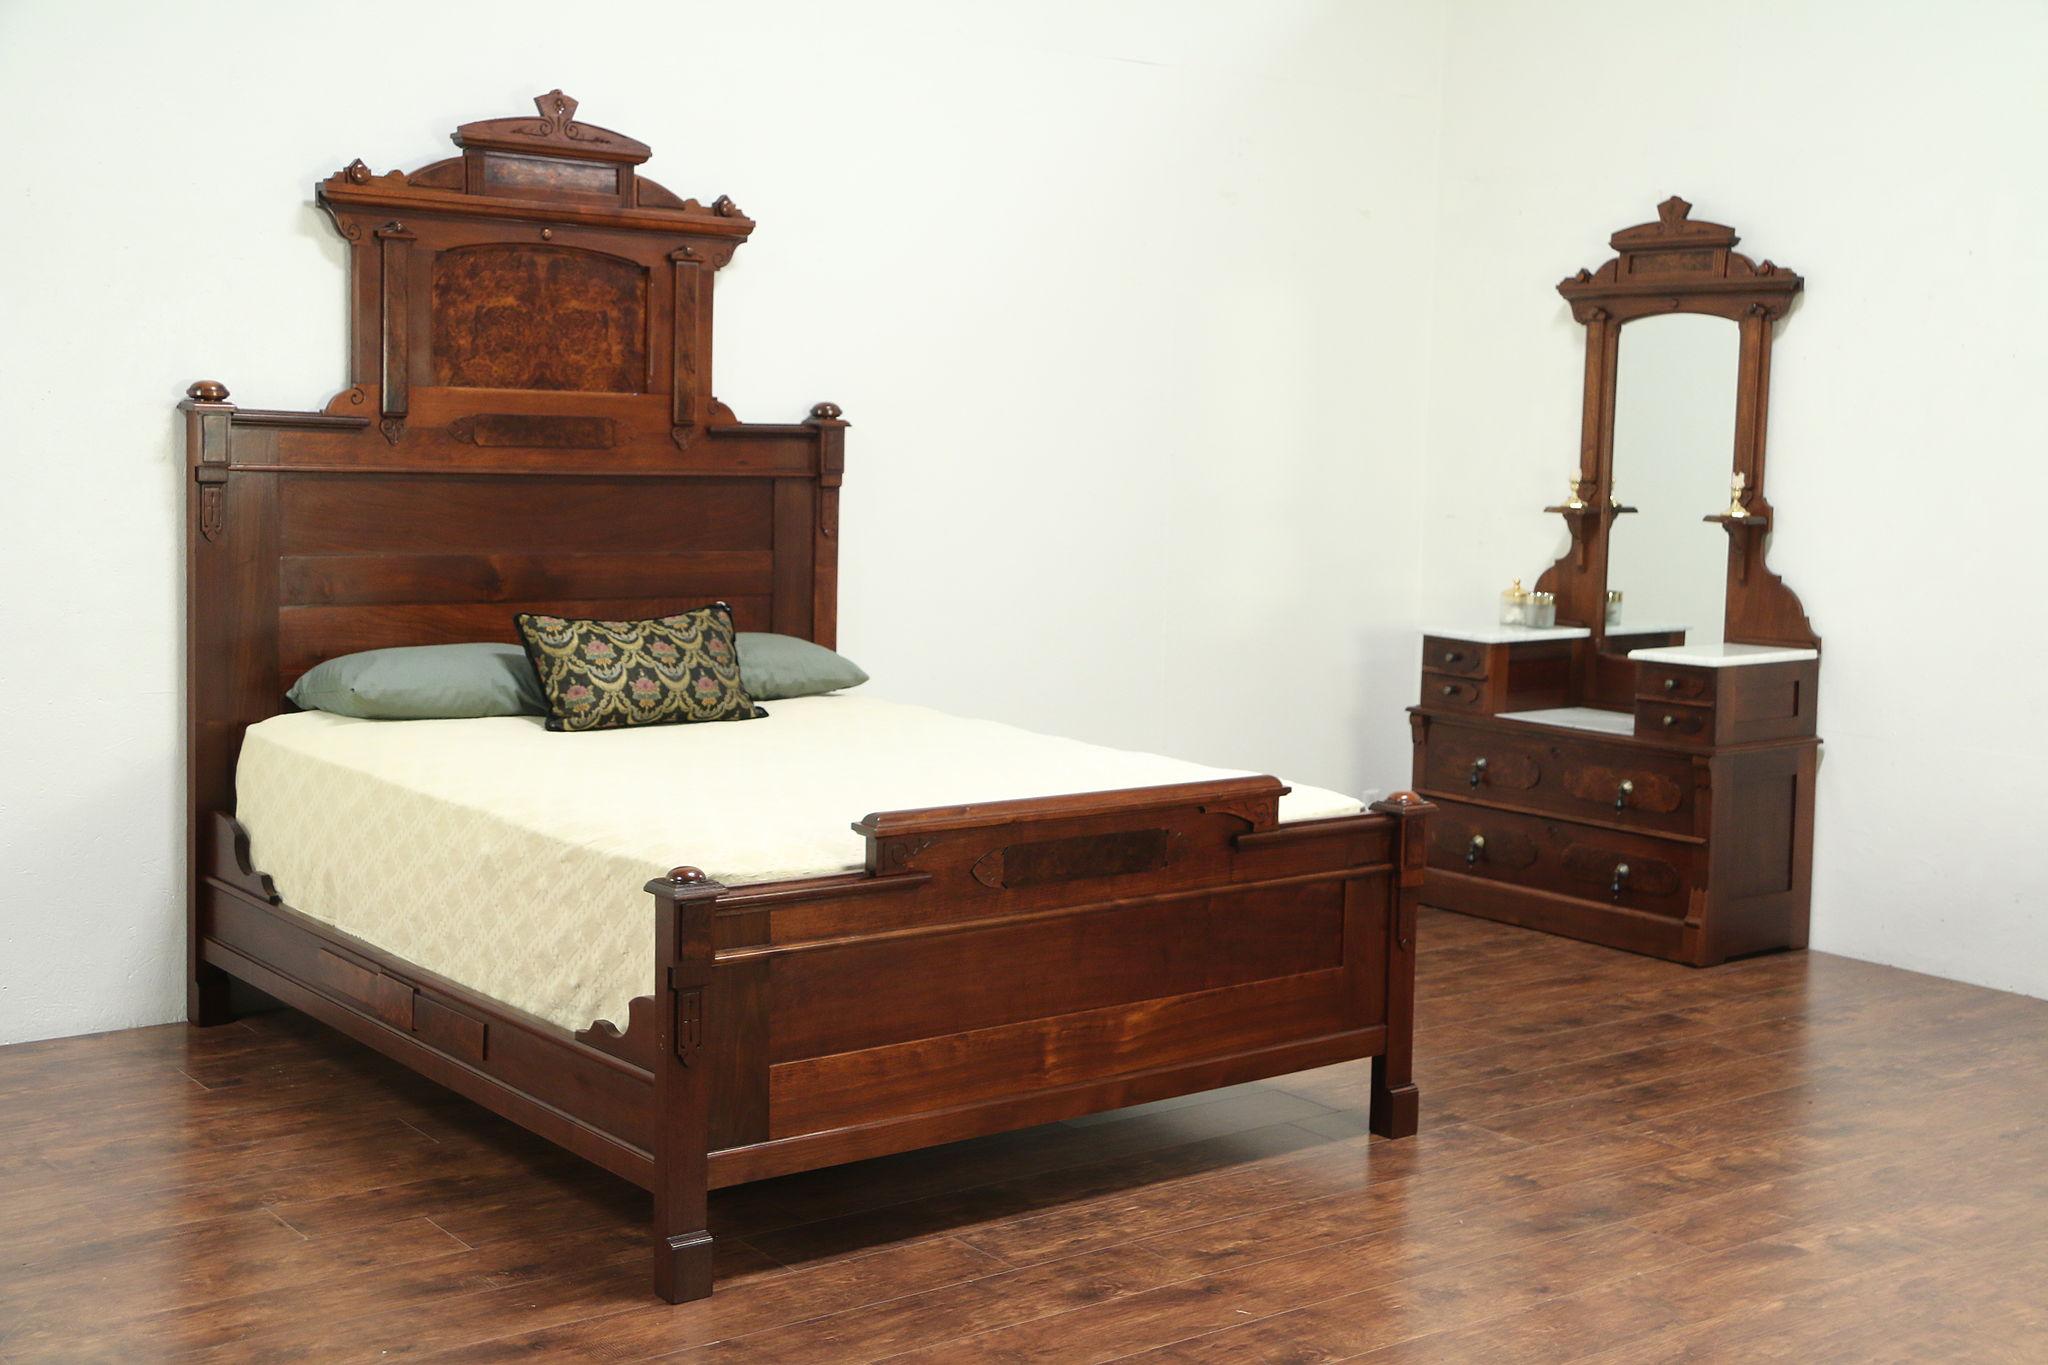 Victorian Antique Walnut Bedroom Set, Queen Size Bed, Marble Top Chest  #28954